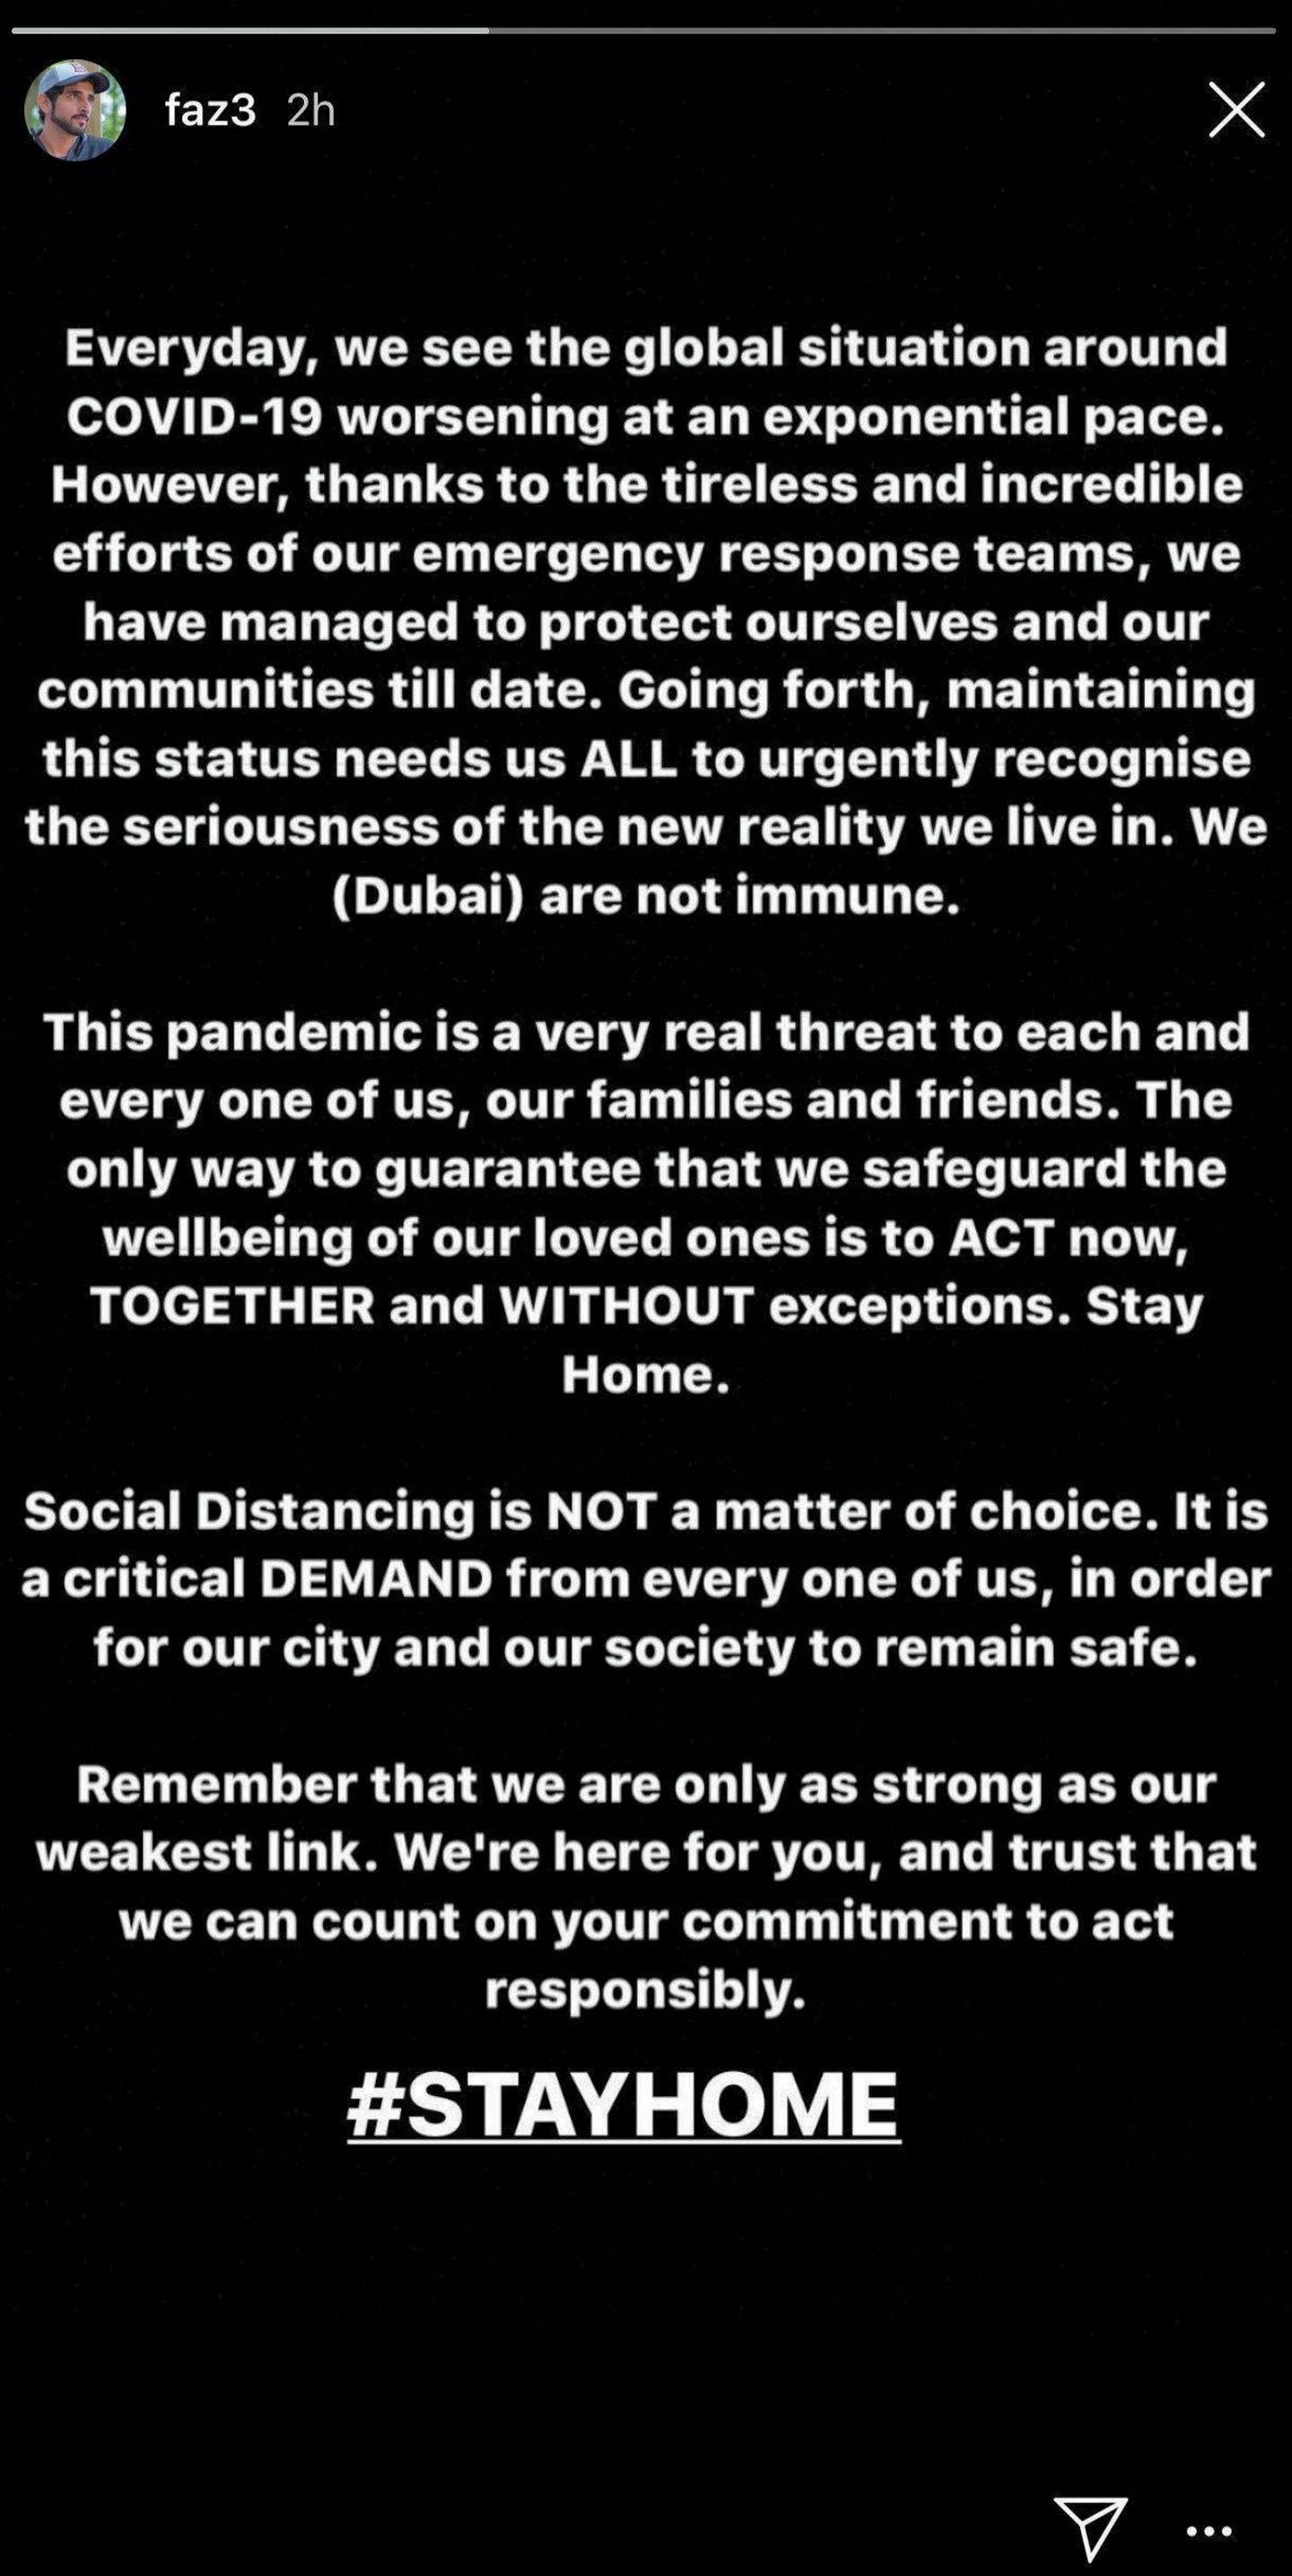 Sheikh Hamdan's Instagram / Instastory message regarding coronavirus and social distancing.